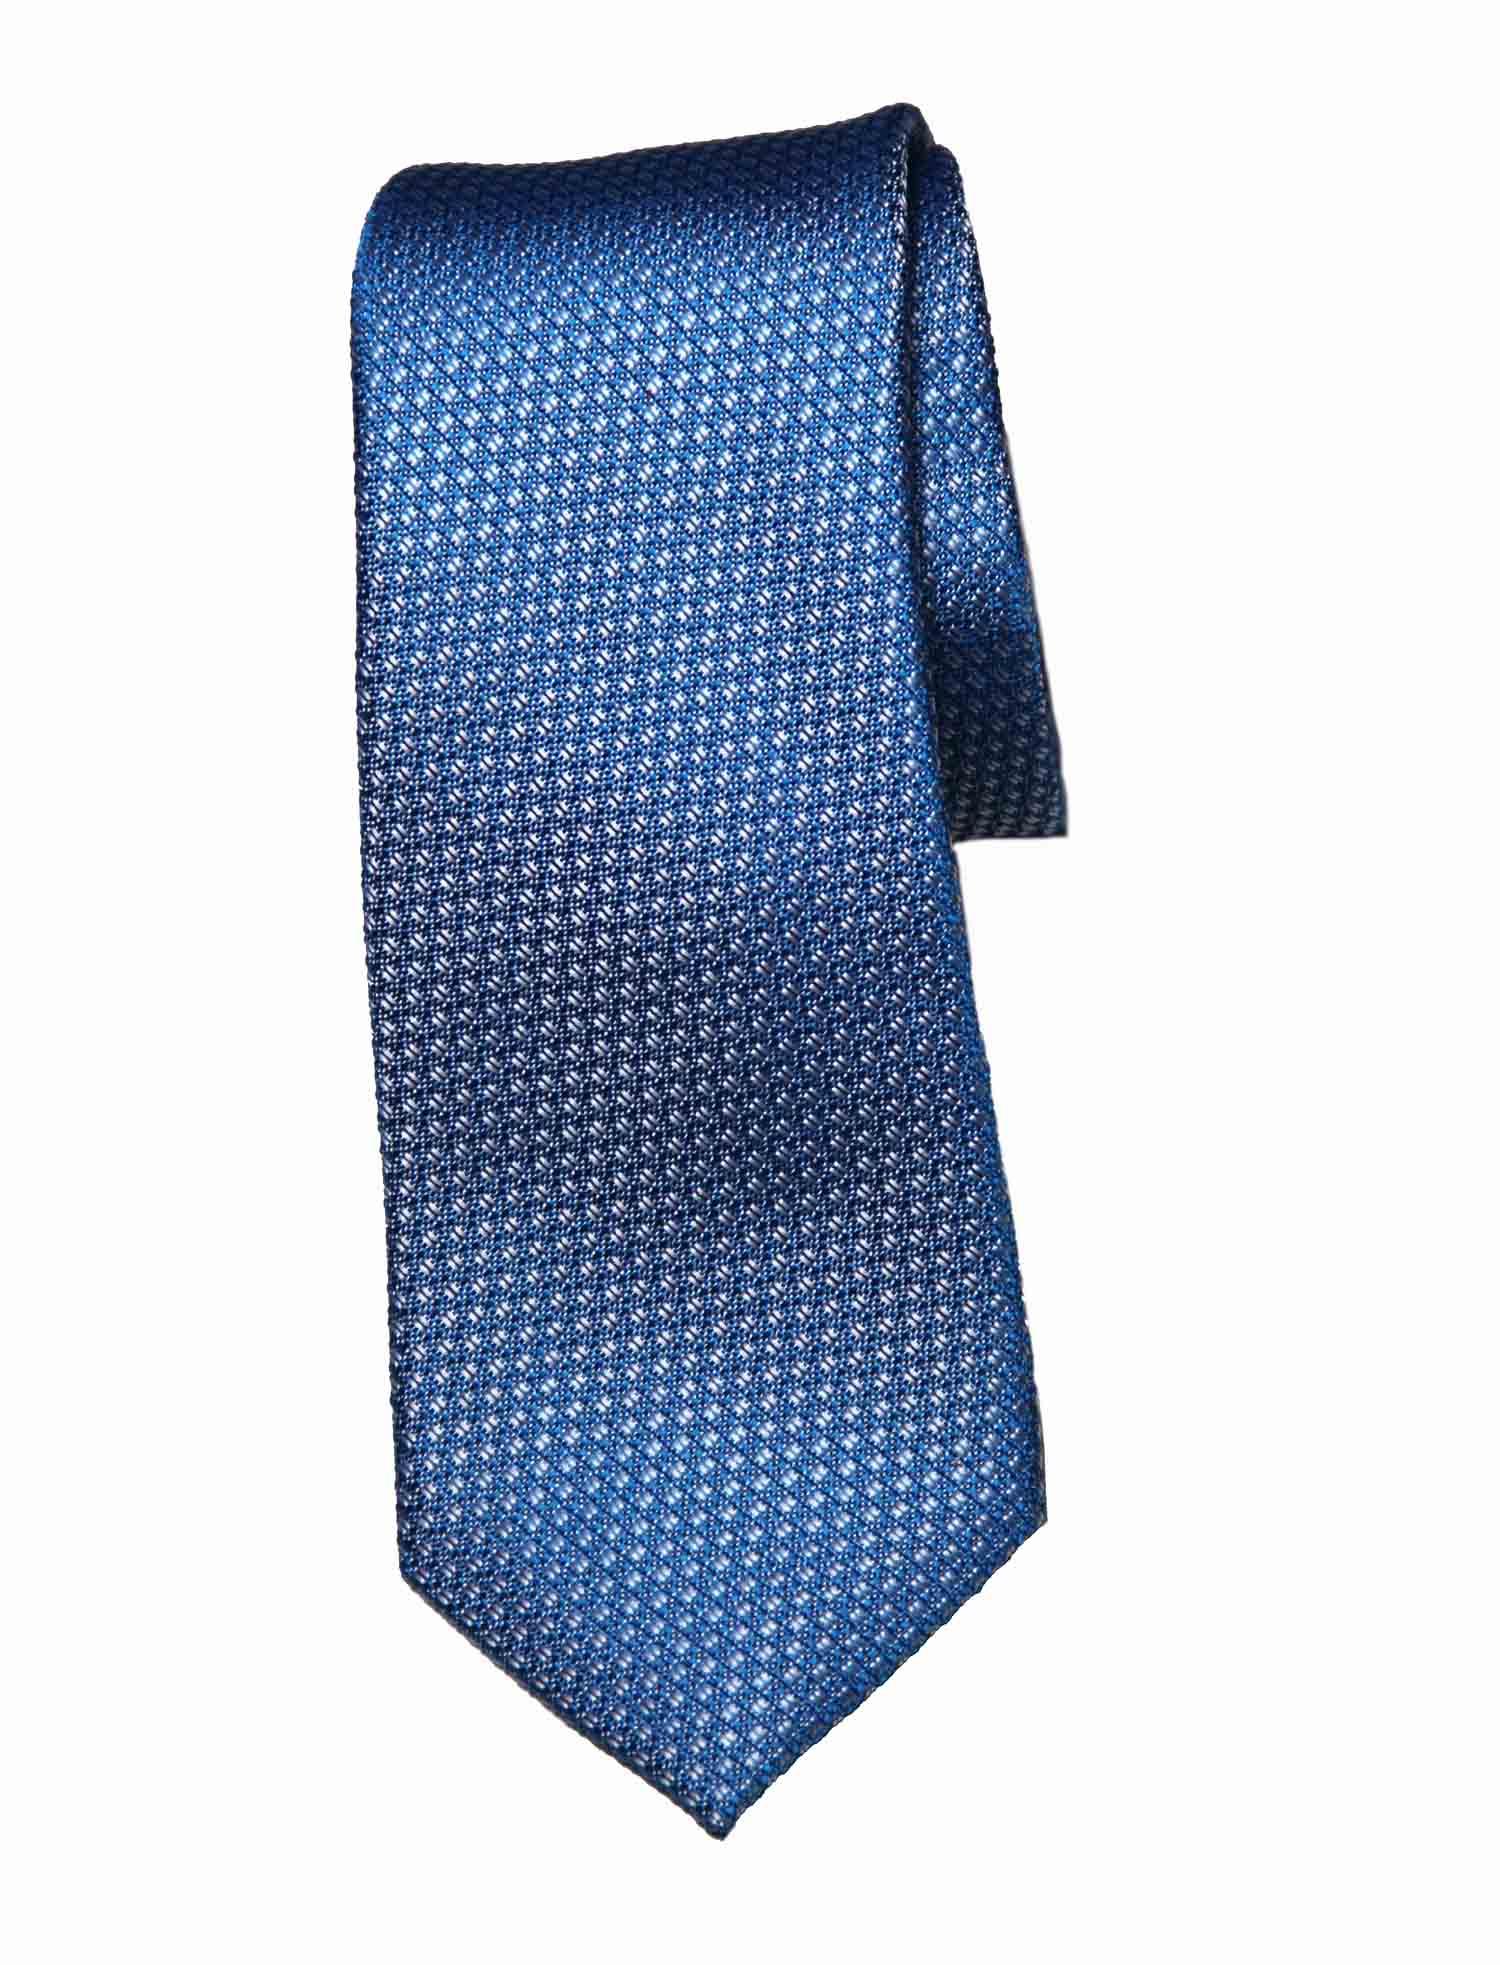 Ted Baker Tie Blue Silk Textured Men's